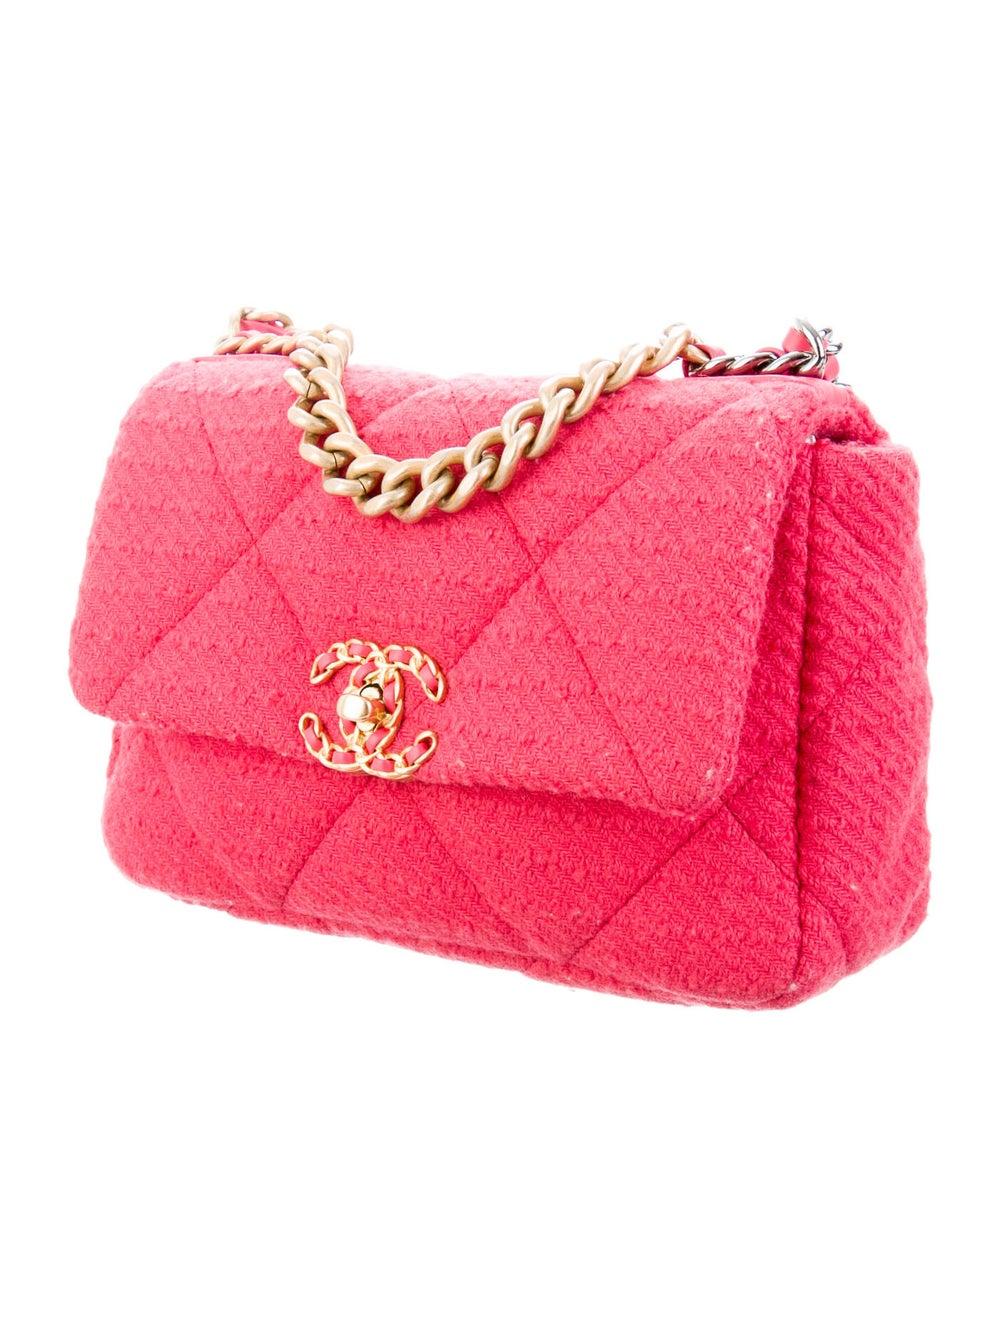 Chanel 2020 Medium Tweed 19 Bag Pink - image 3